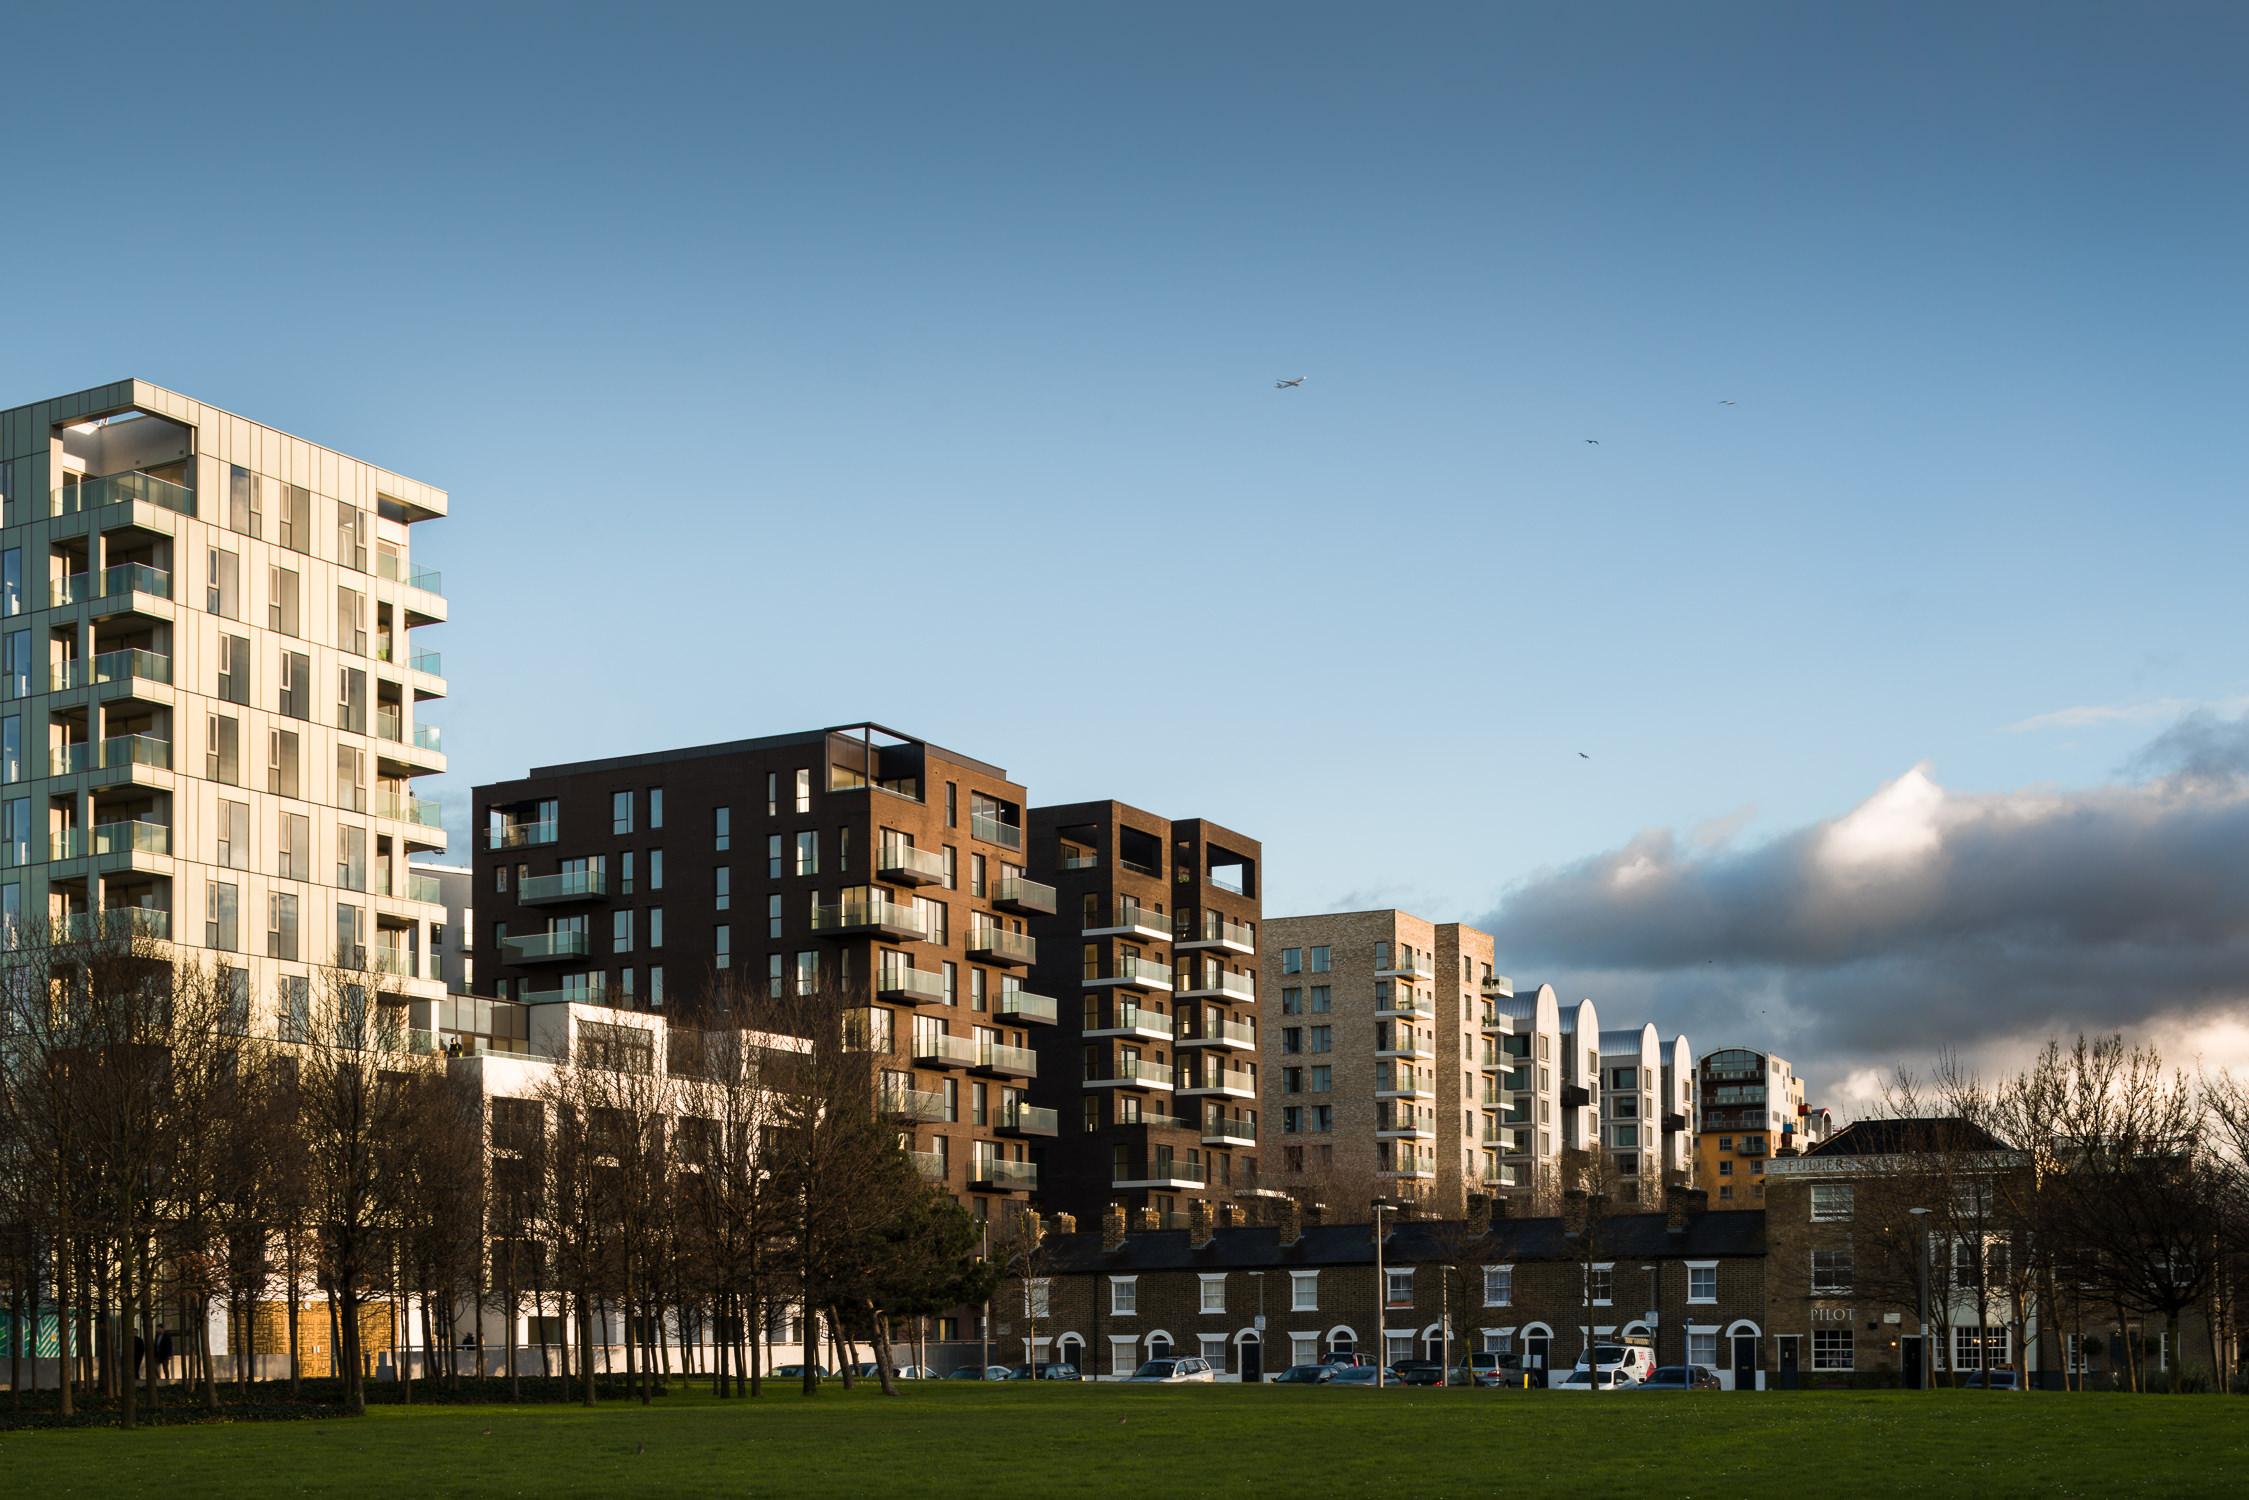 mark-hadden-architecture-photographer-architectuur-interieur-fotografie-london-amsterdam-GreenwichPeninsula-431.jpg